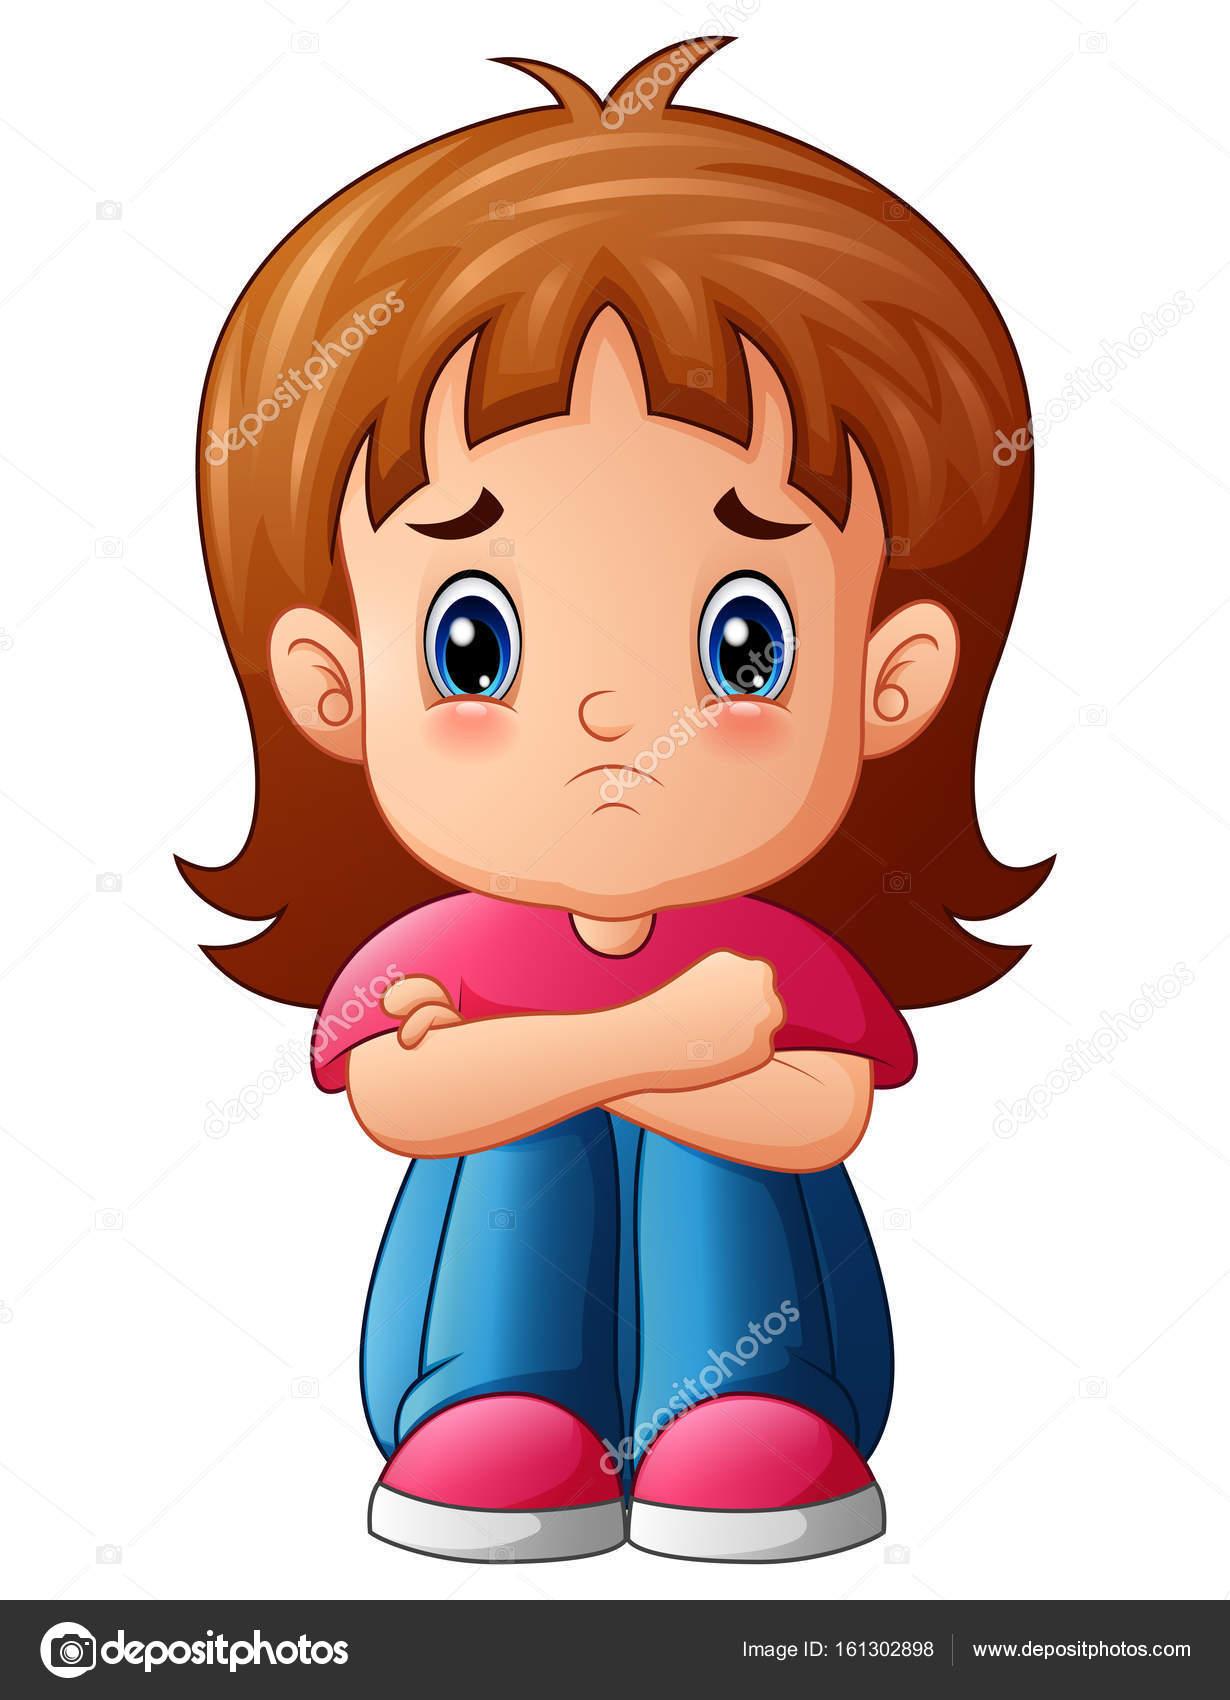 Alone Girl Wallpaper Mobile9 Sad Girl Cartoon Images Hd Cartoon Ankaperla Com